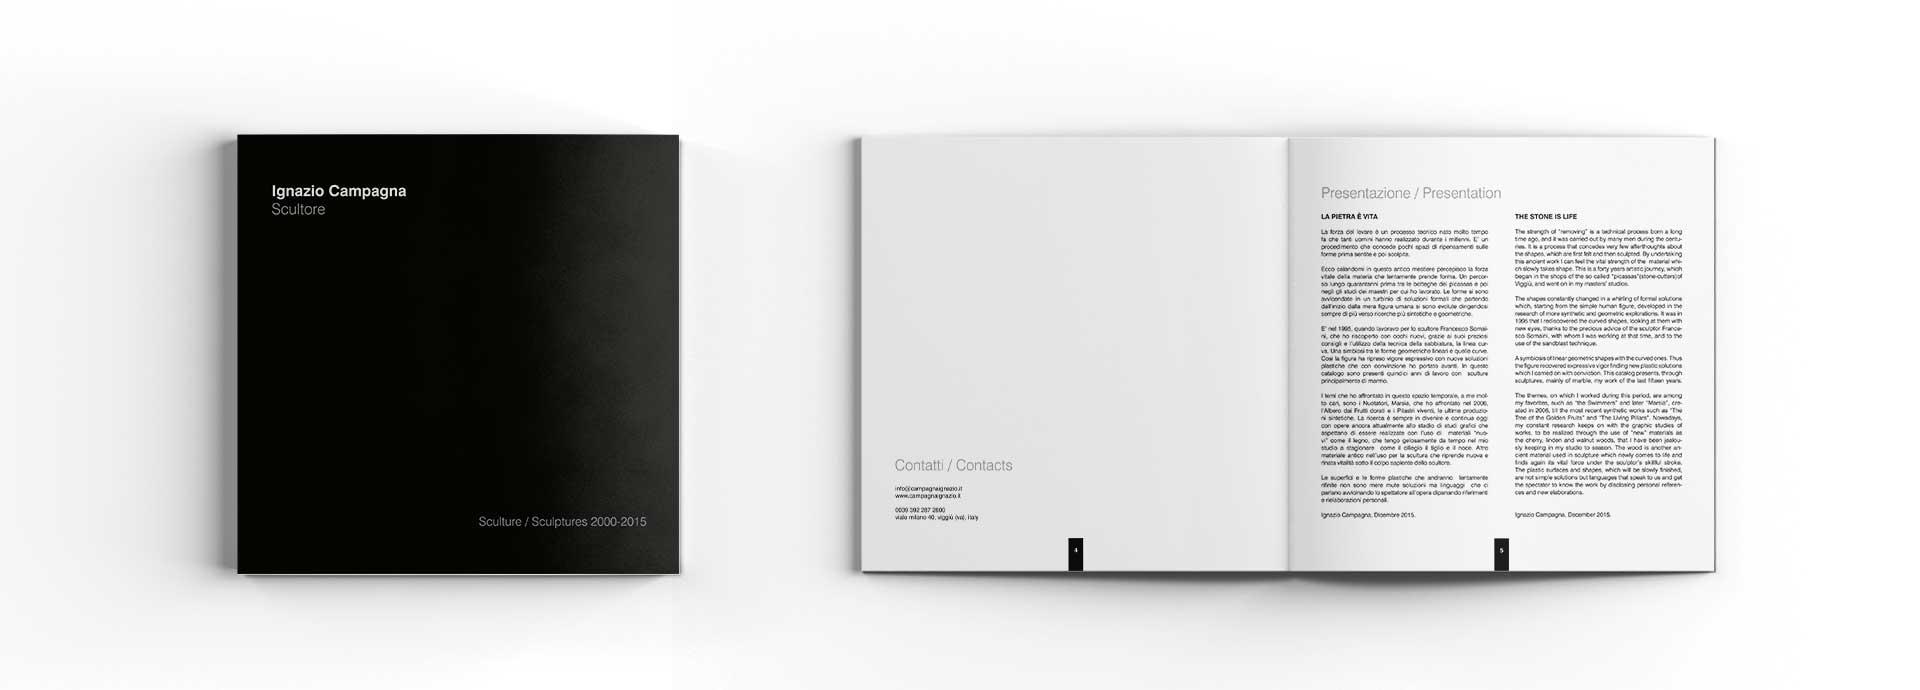 Studio grafico catalogo artista